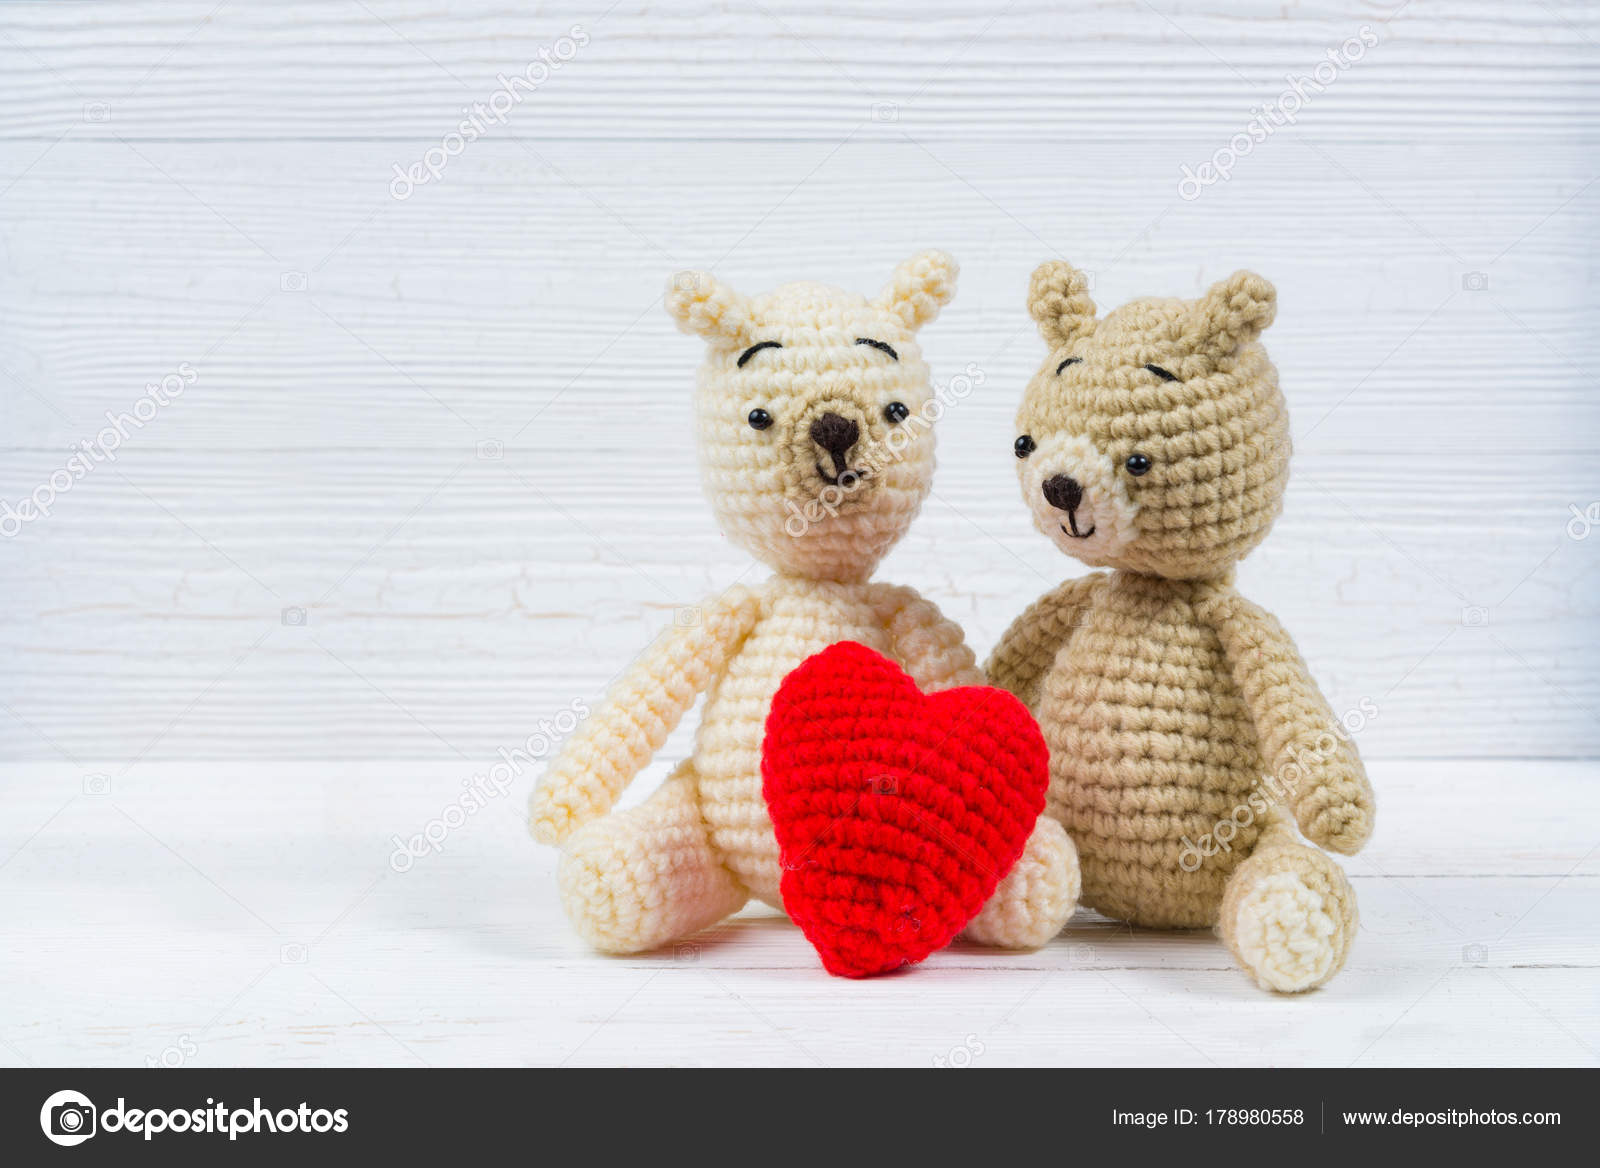 Crochet Valentine Teddy Bears - Free Patterns - DIY 4 EVER | 1168x1600